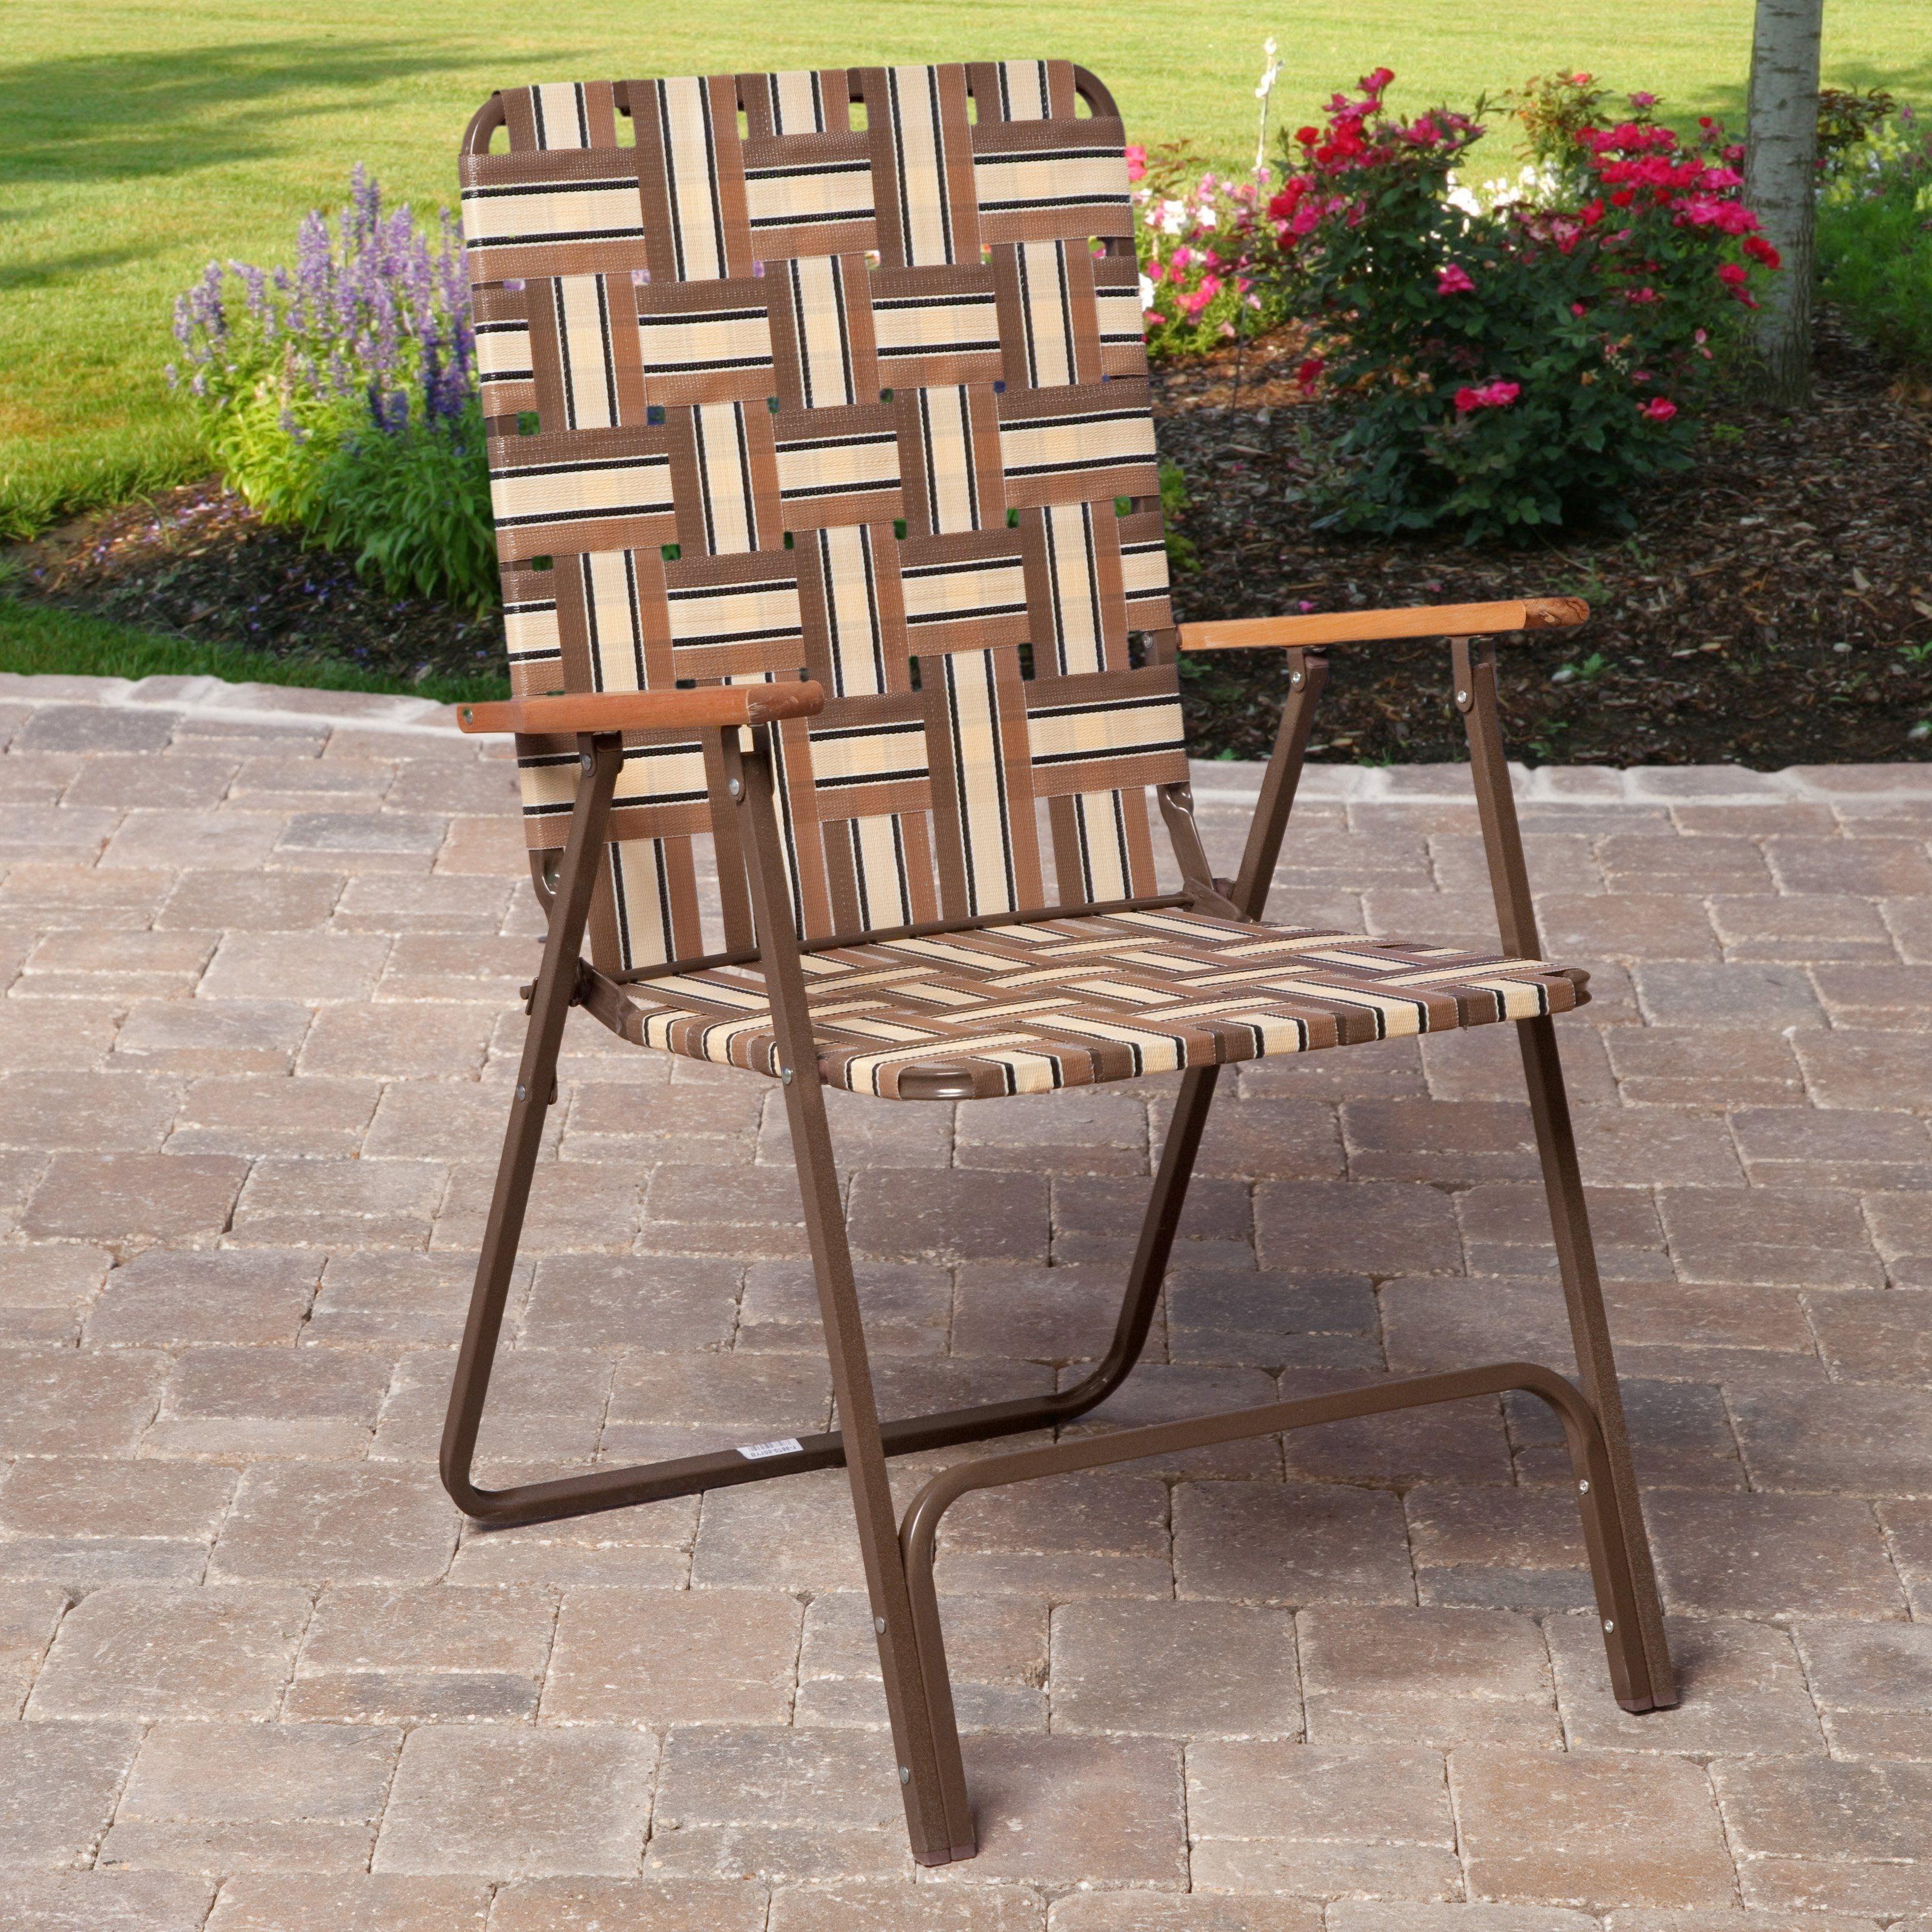 Charmant Webbed Lawn Chairs Folding Aluminum